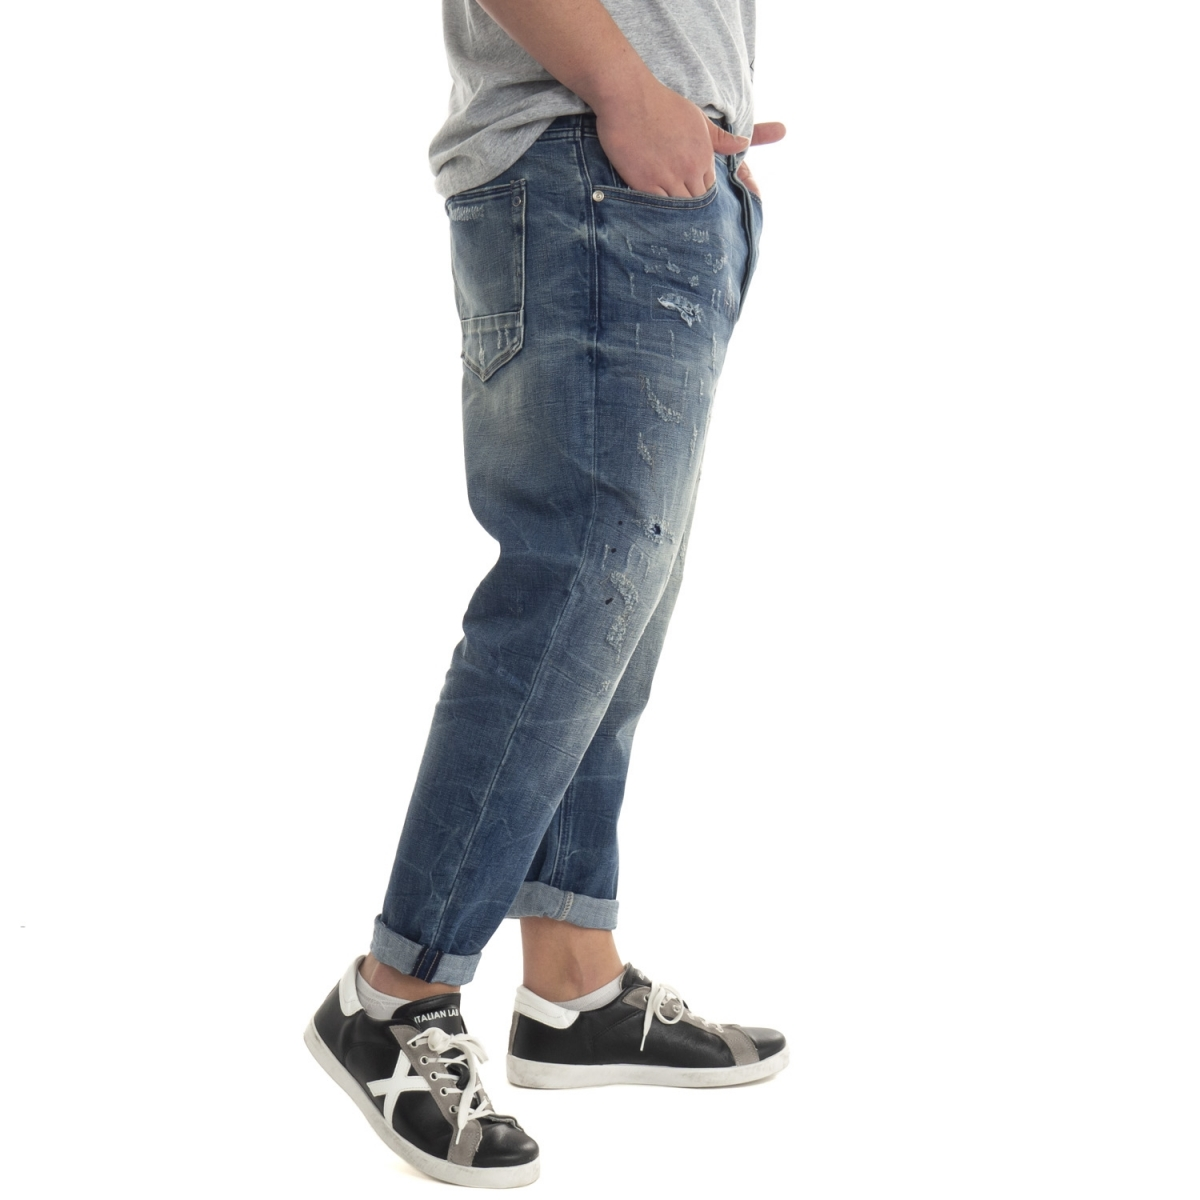 vêtements Jeans homme GL073F BLU Cafedelmar Shop